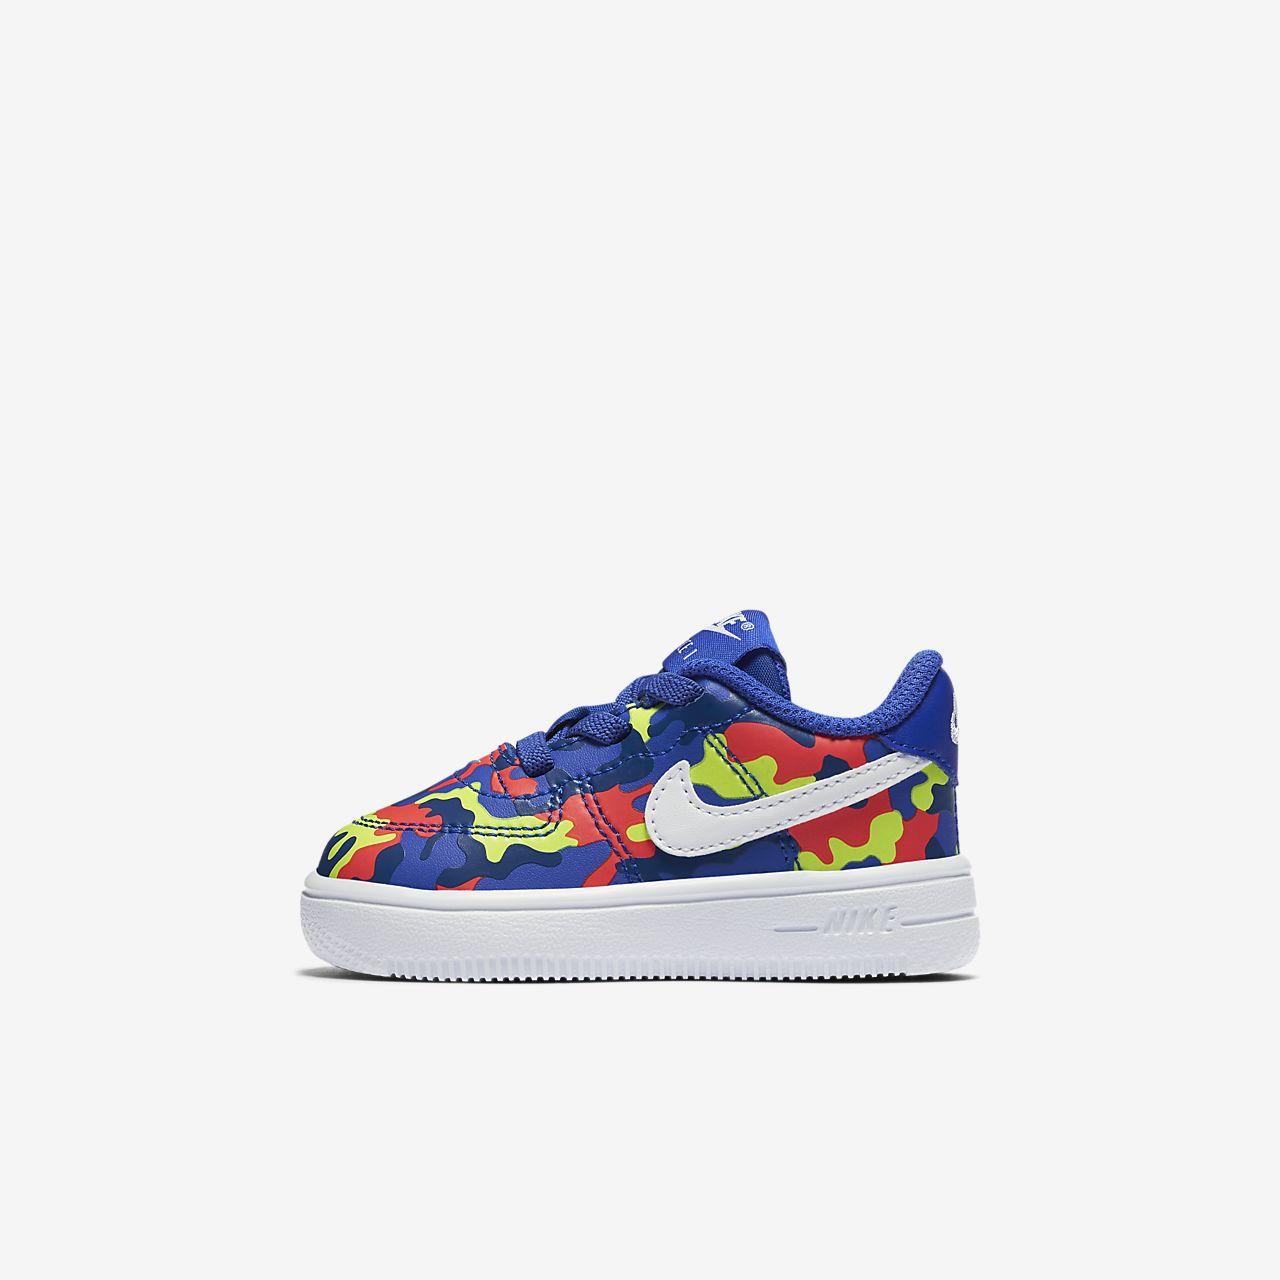 70a95b685442 Nike Force 1 18 Print Baby  amp  Toddler Shoe. Nike.com AU